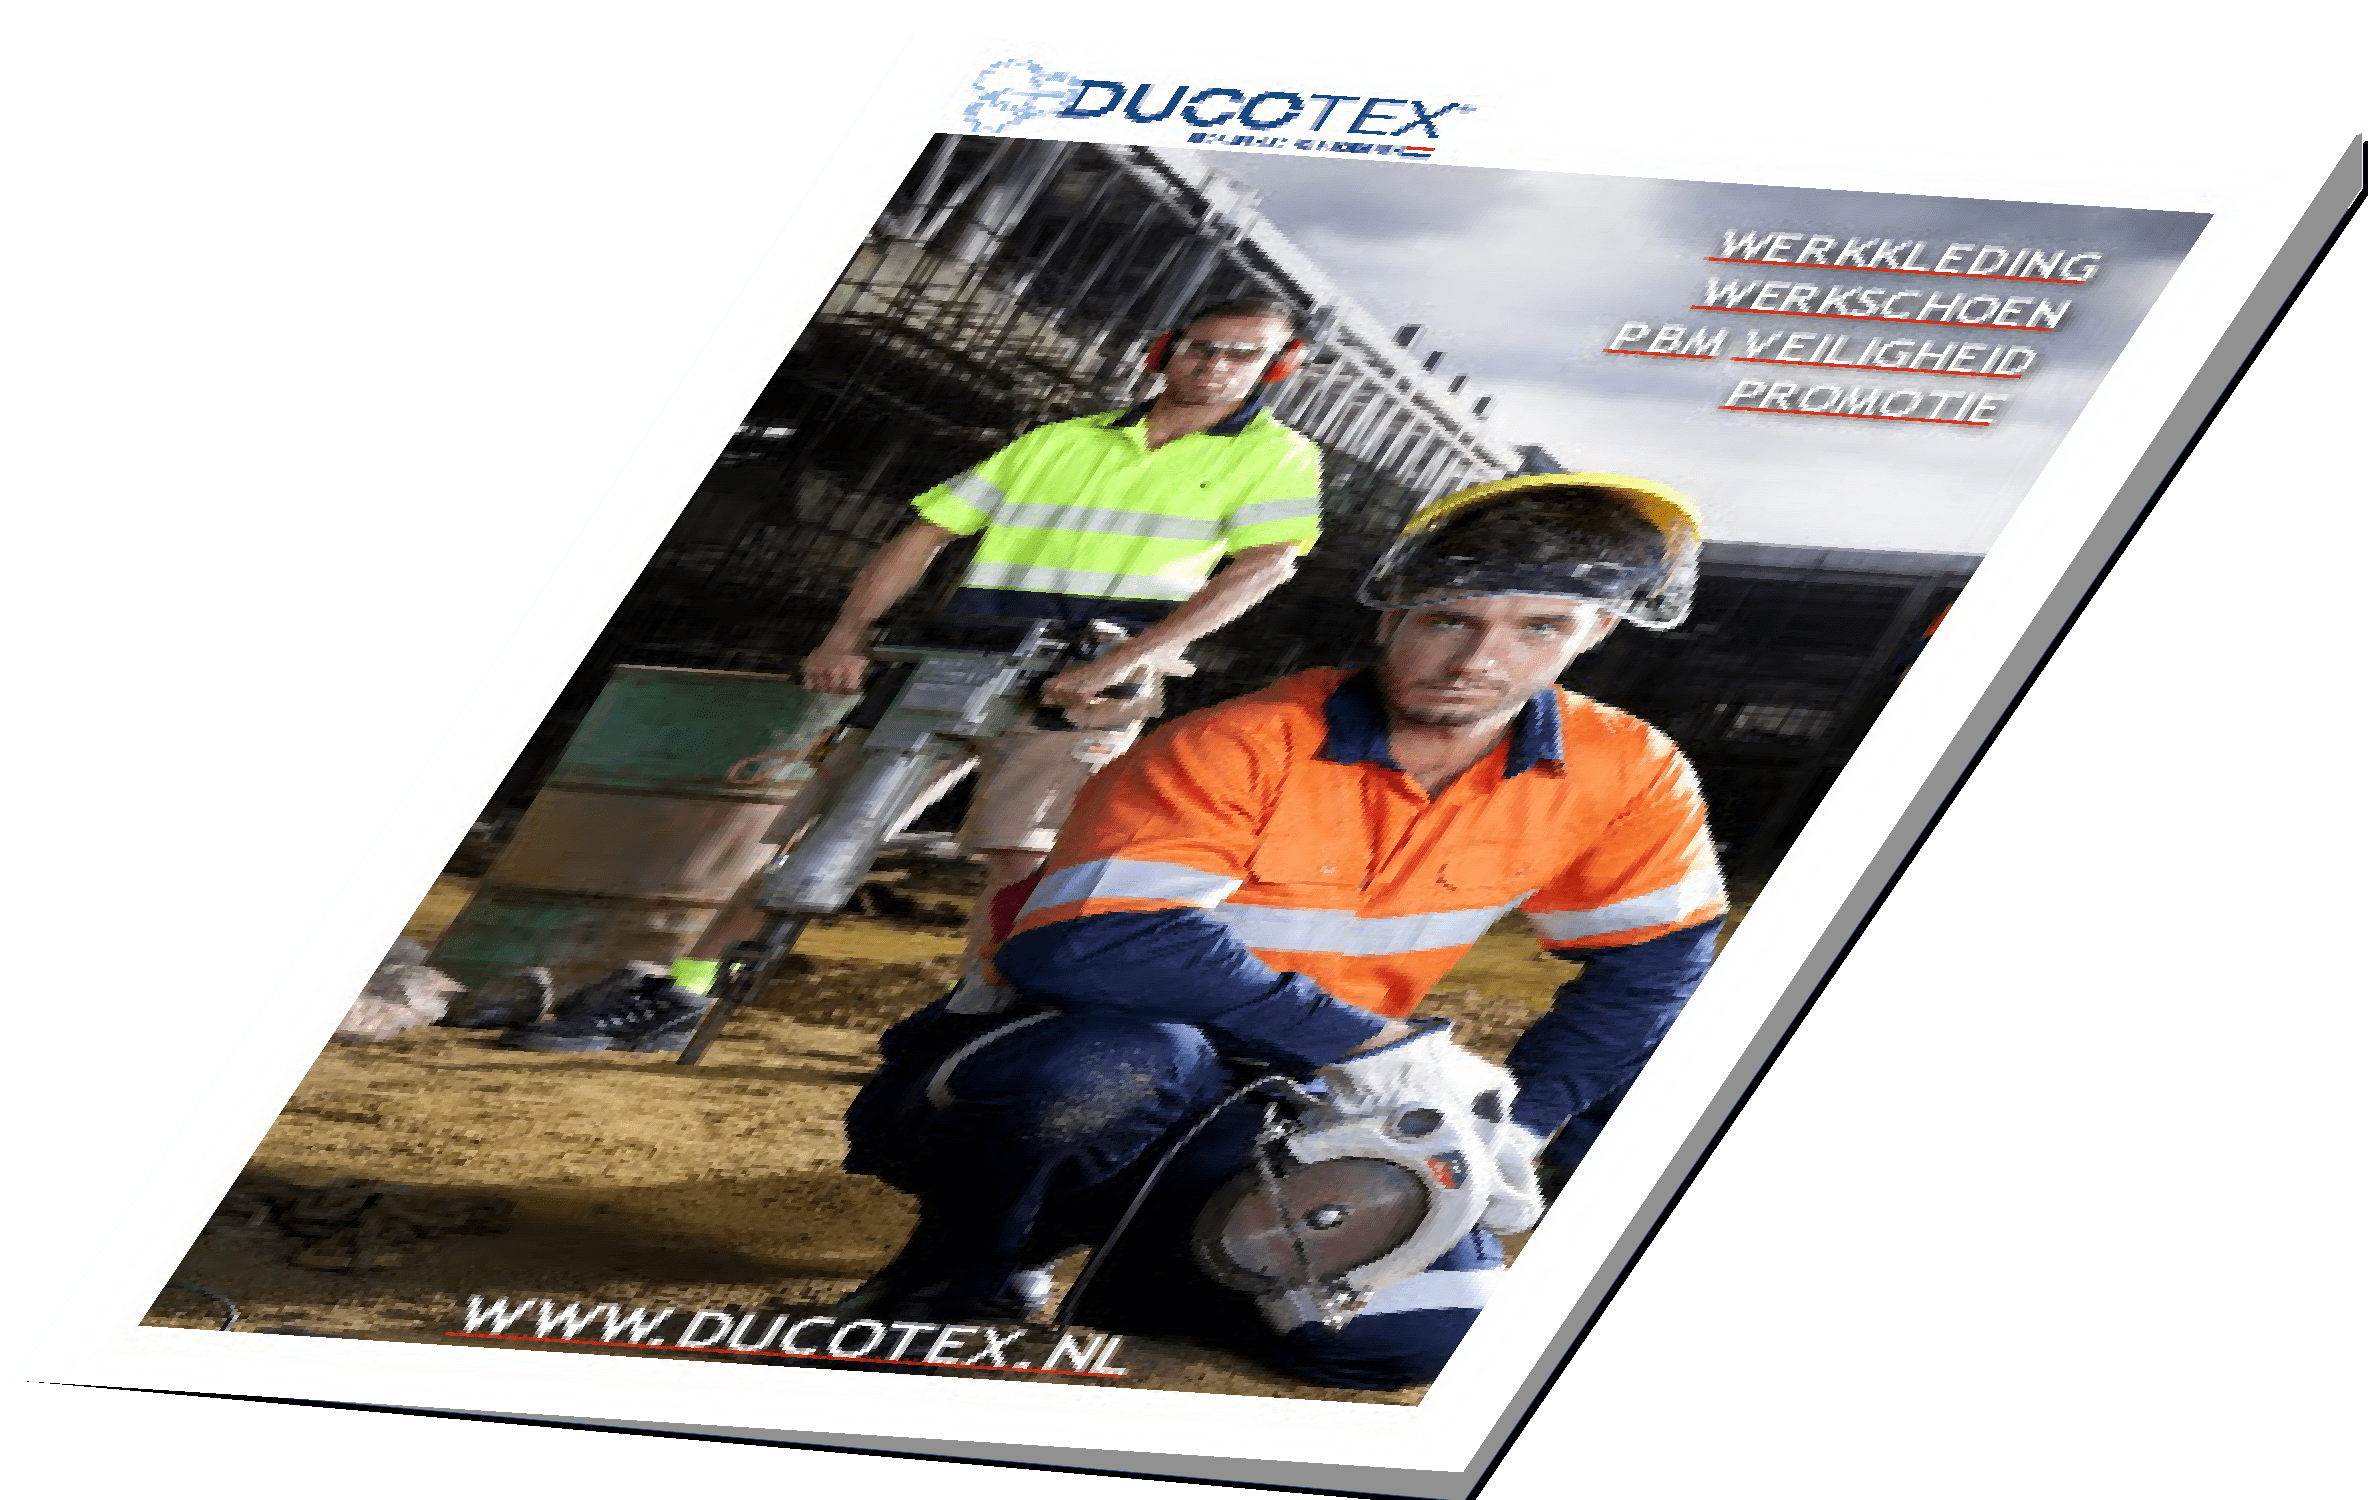 Ducotex_kaft_catalogus_2020